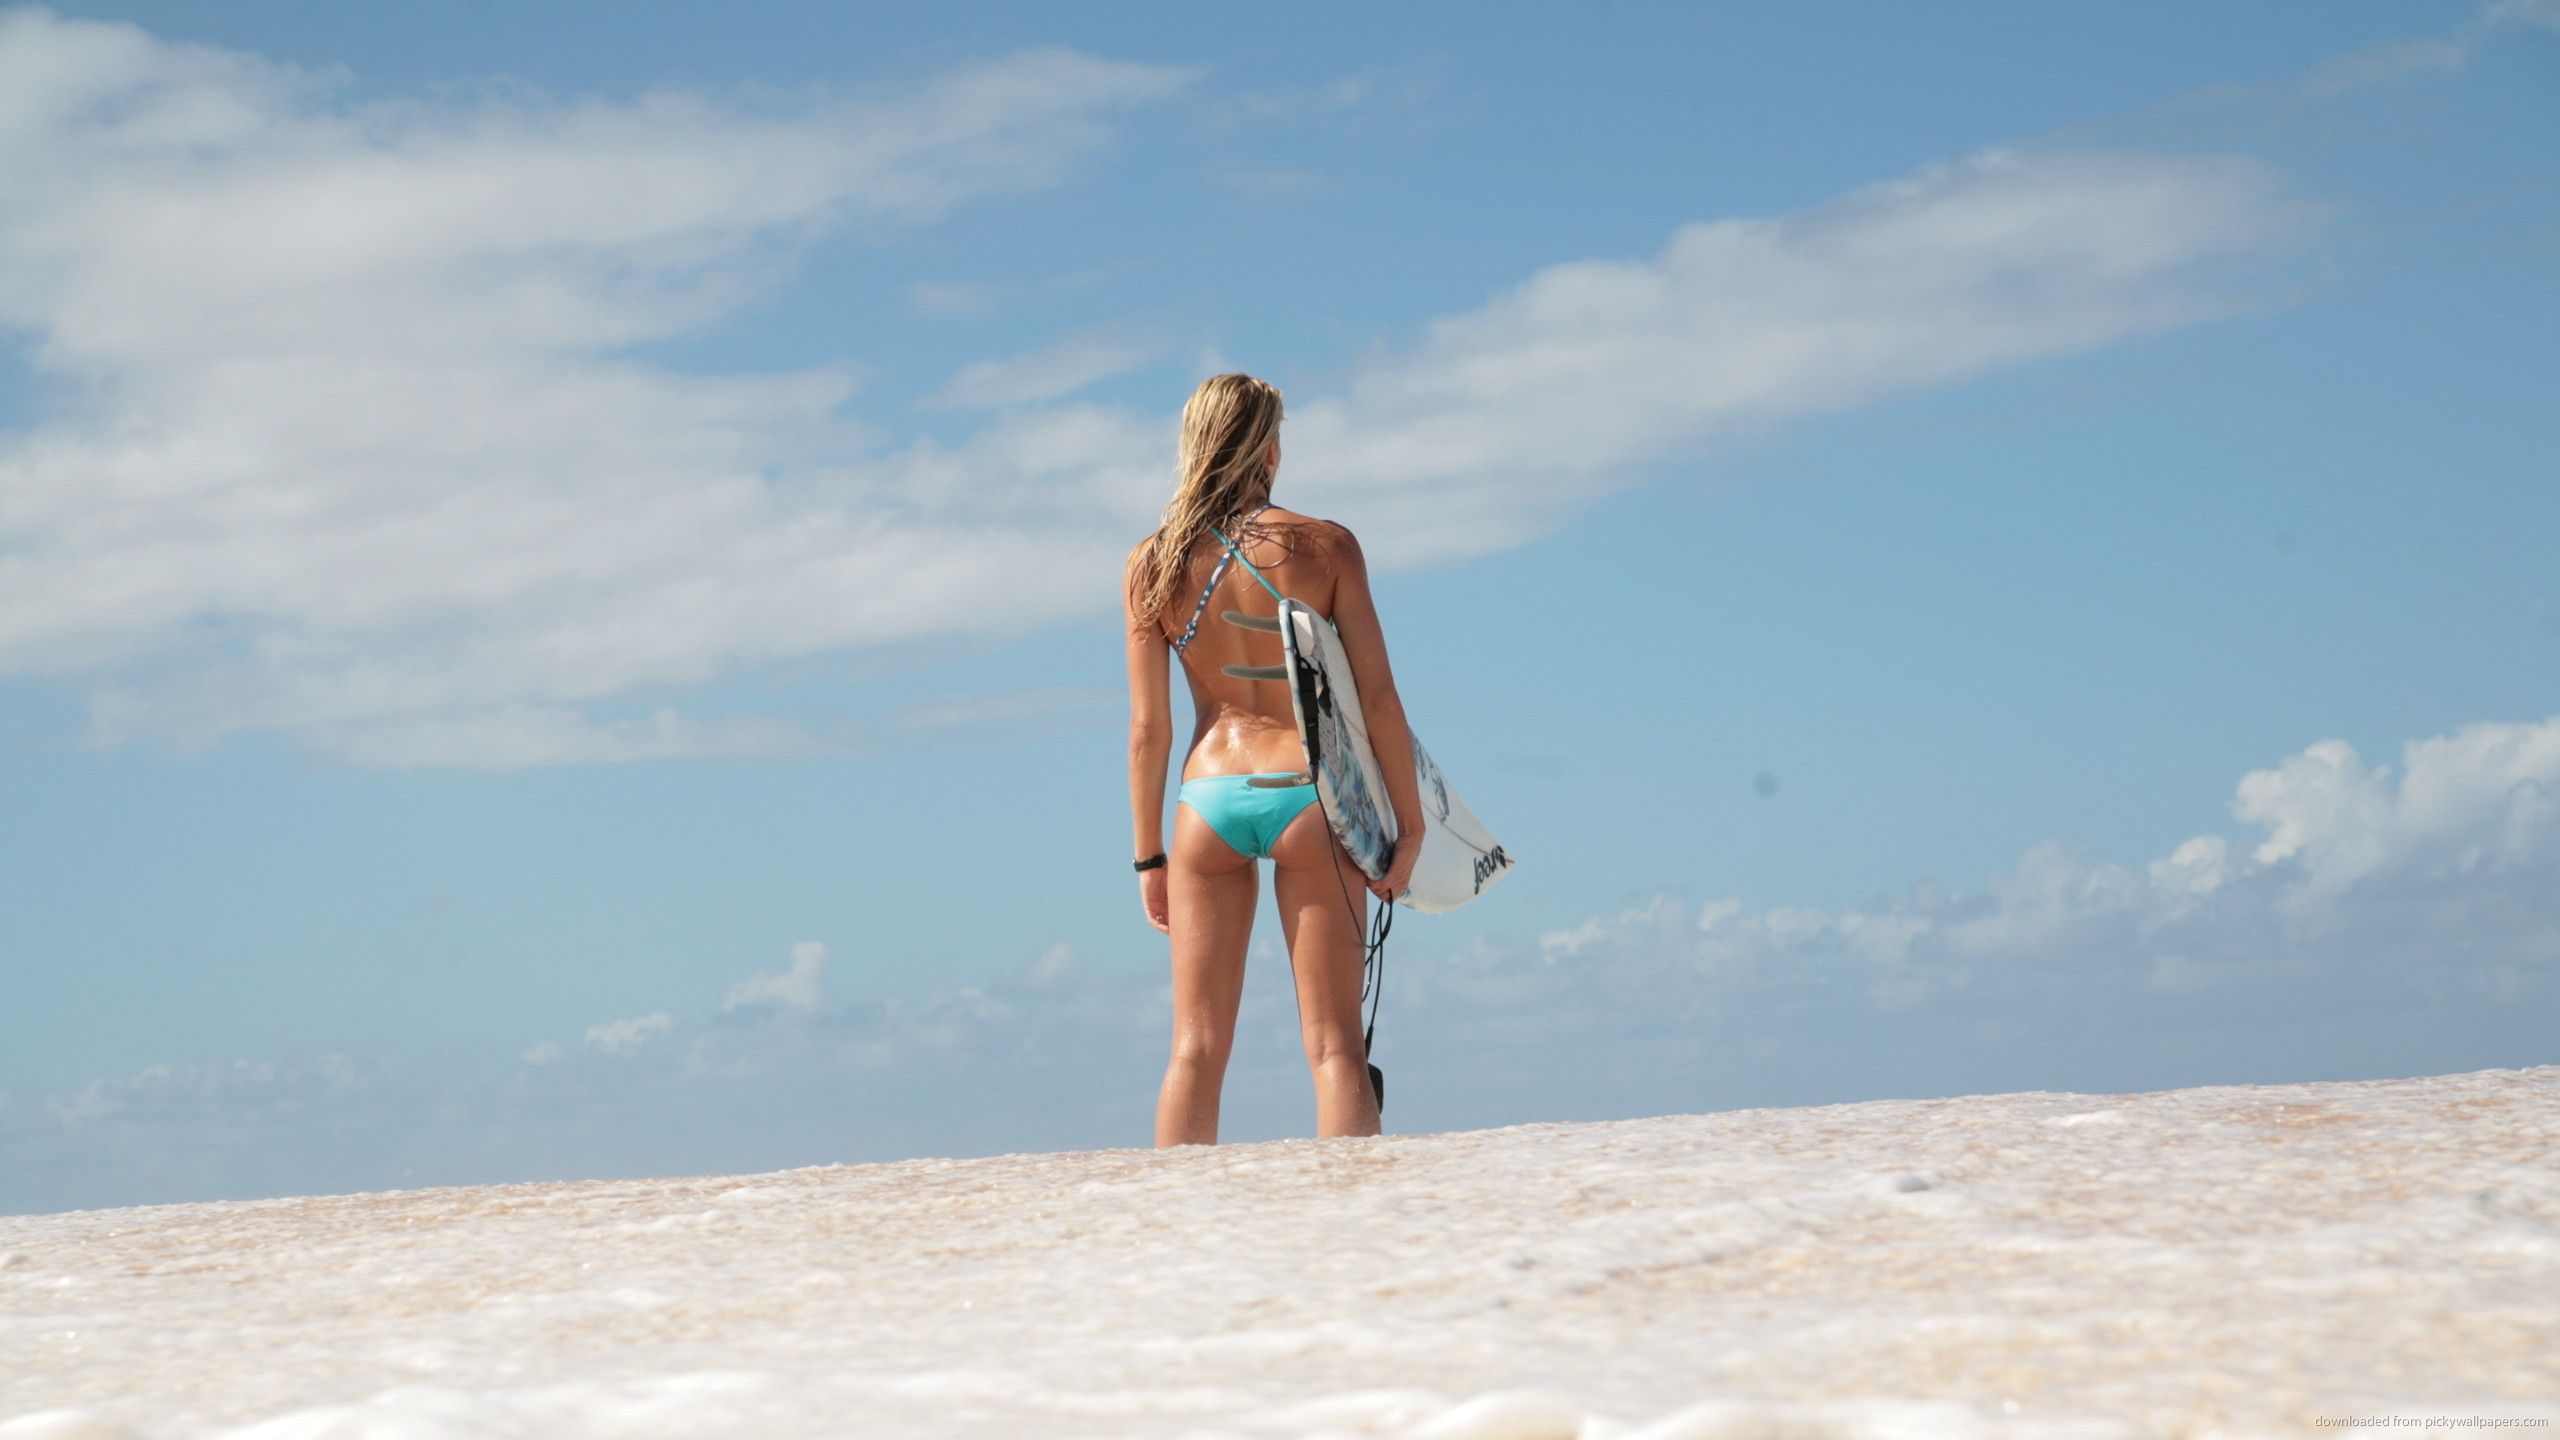 Surfer Girl On The Beach for 2560×1440